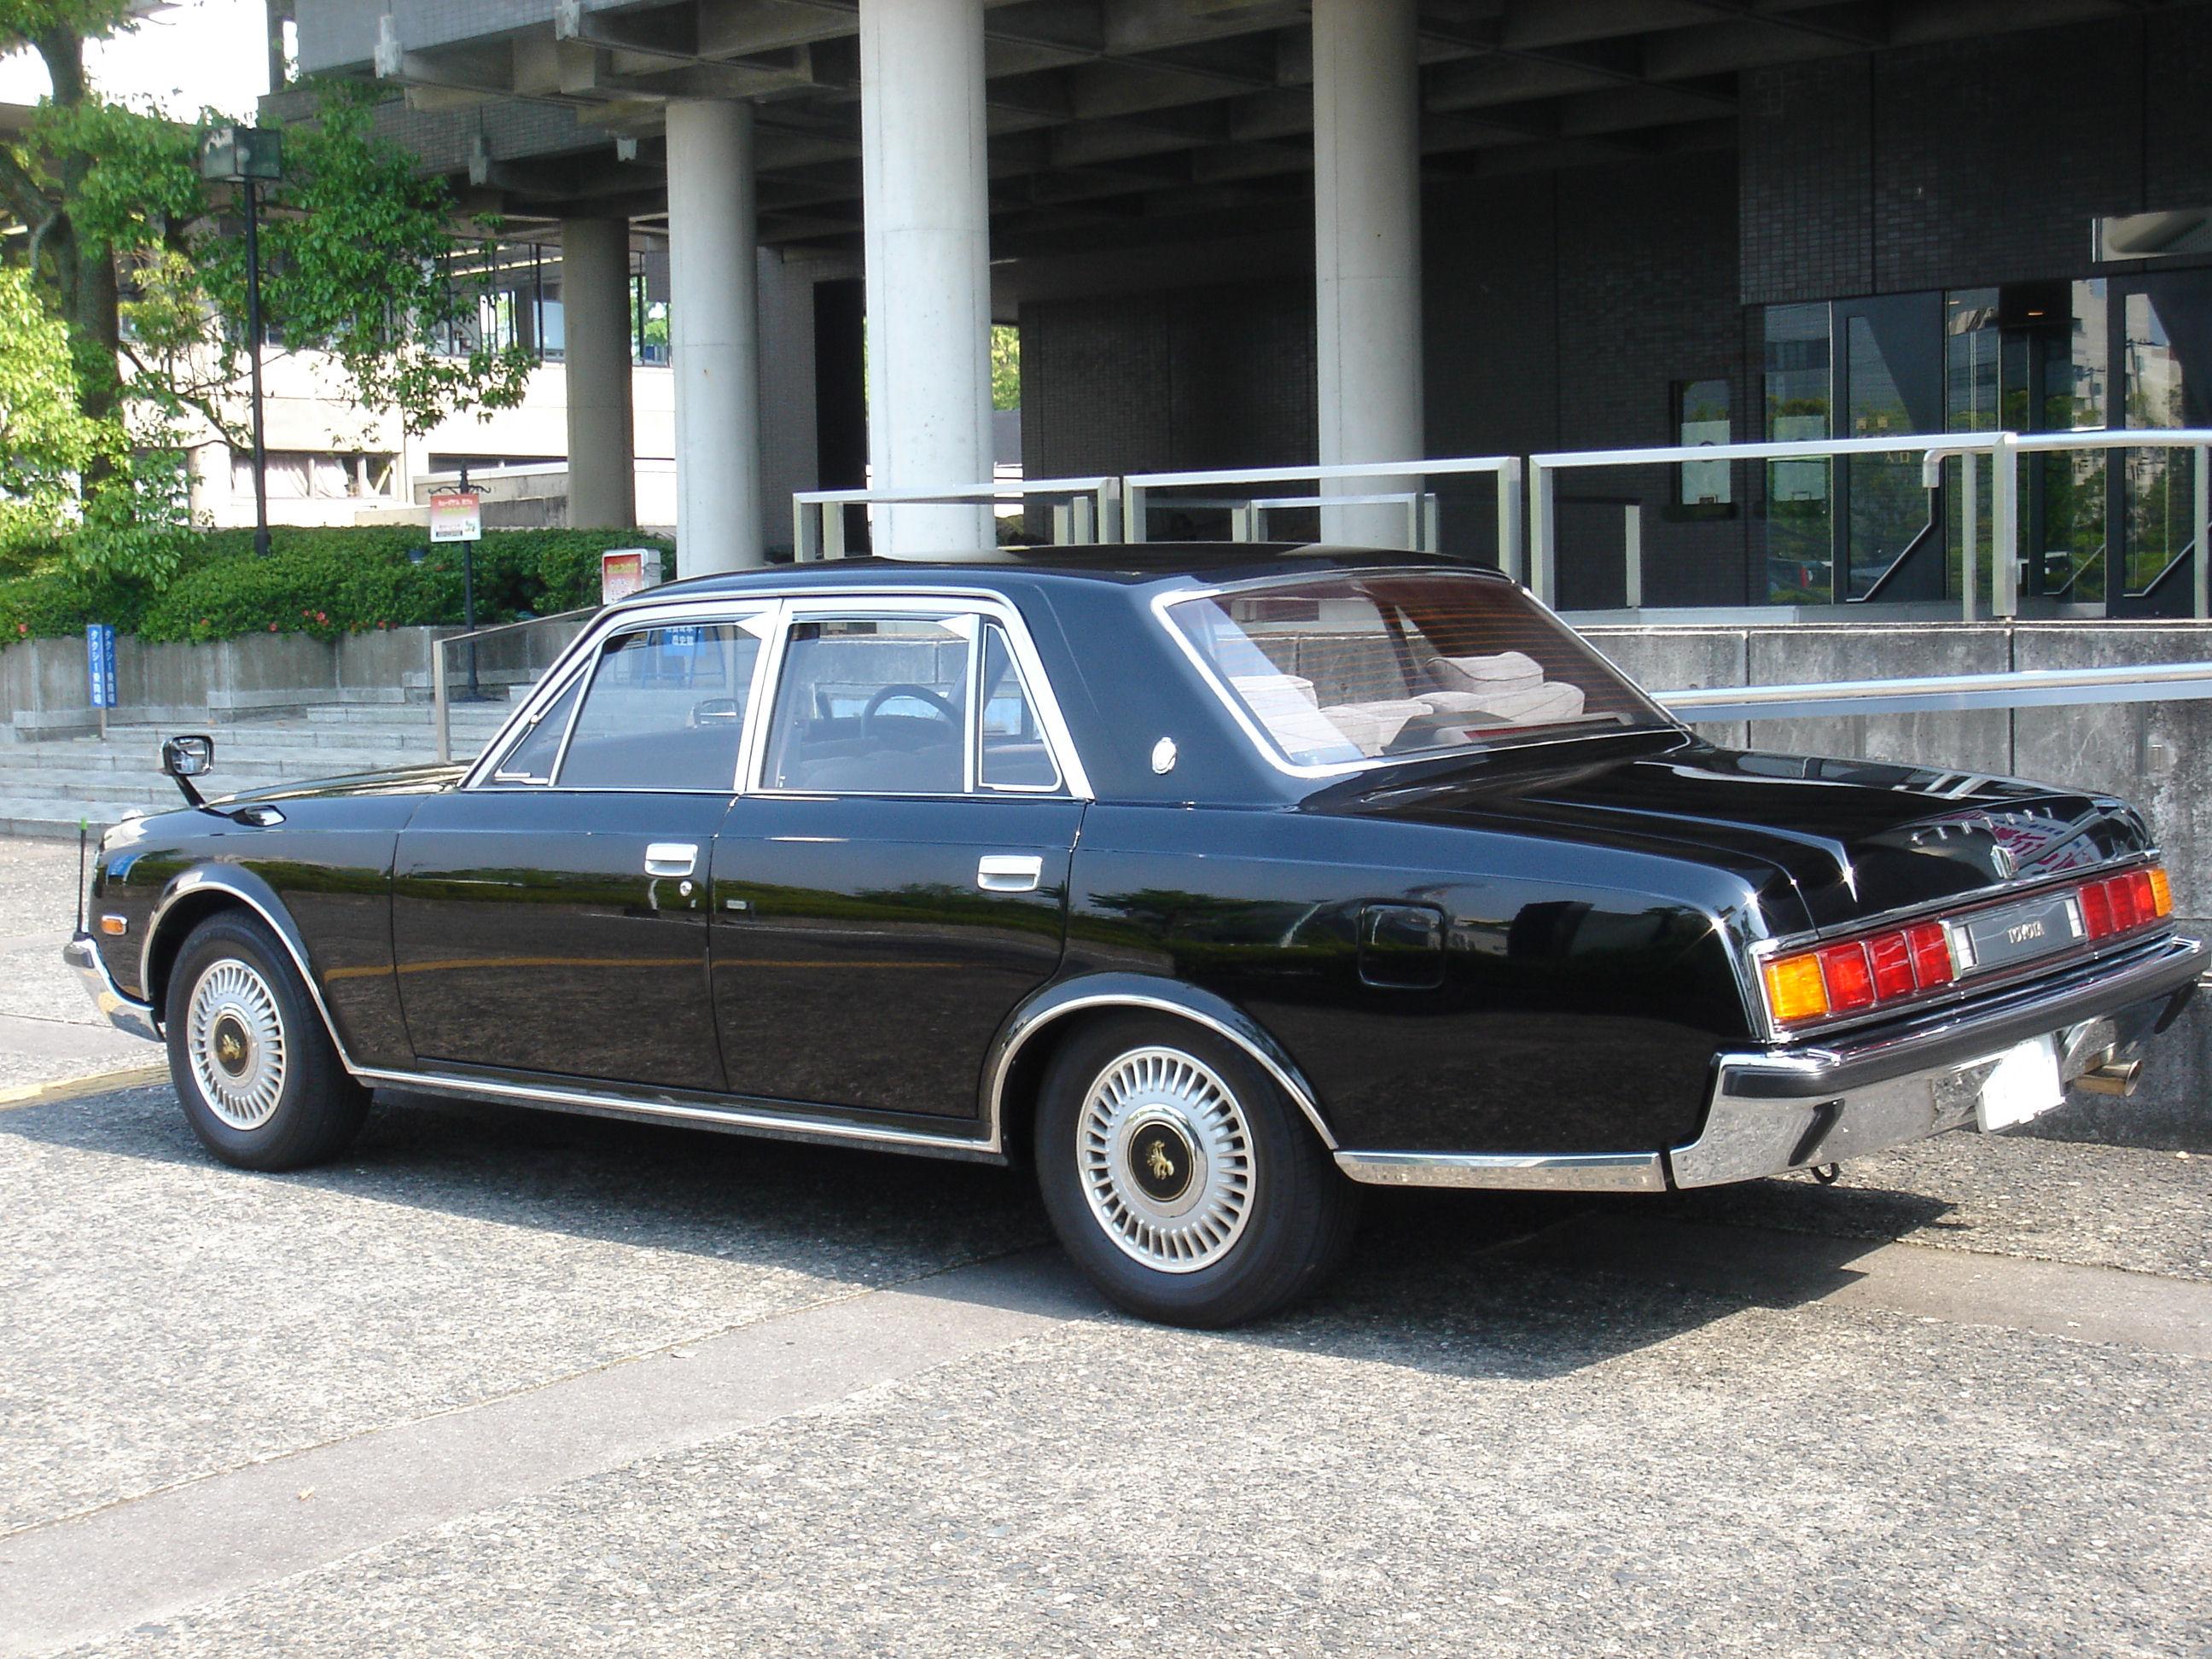 VG40_Toyota_century2